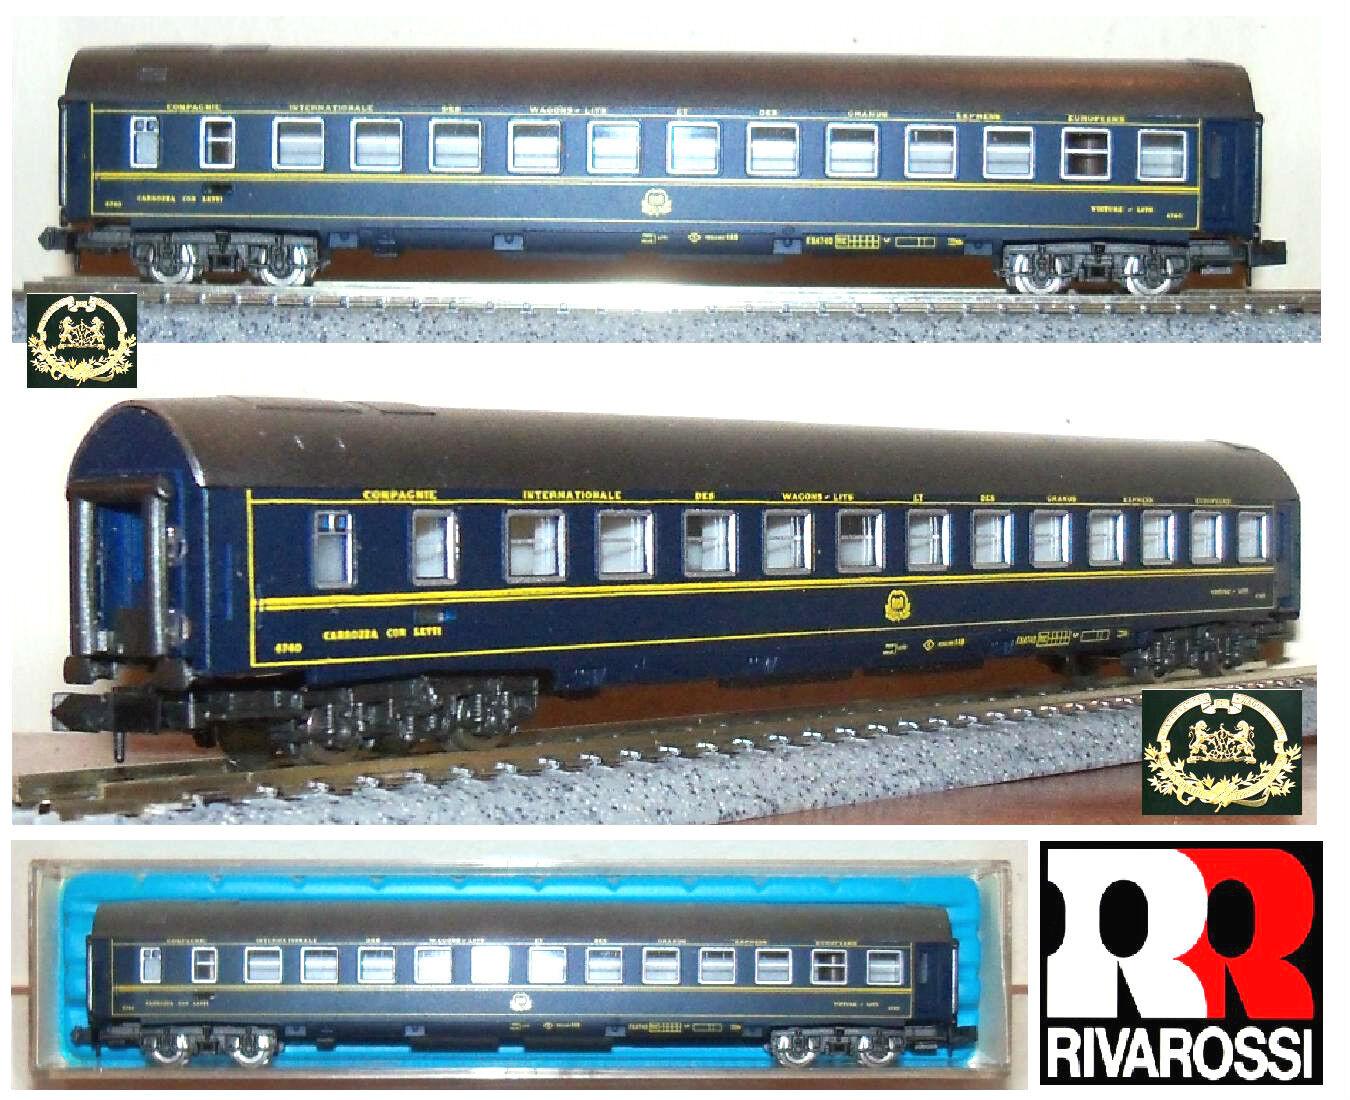 Rivarossi 2686 Vintage Sleeper Compartment Sleeping Car CIWL FS  4740 OVP scale-N